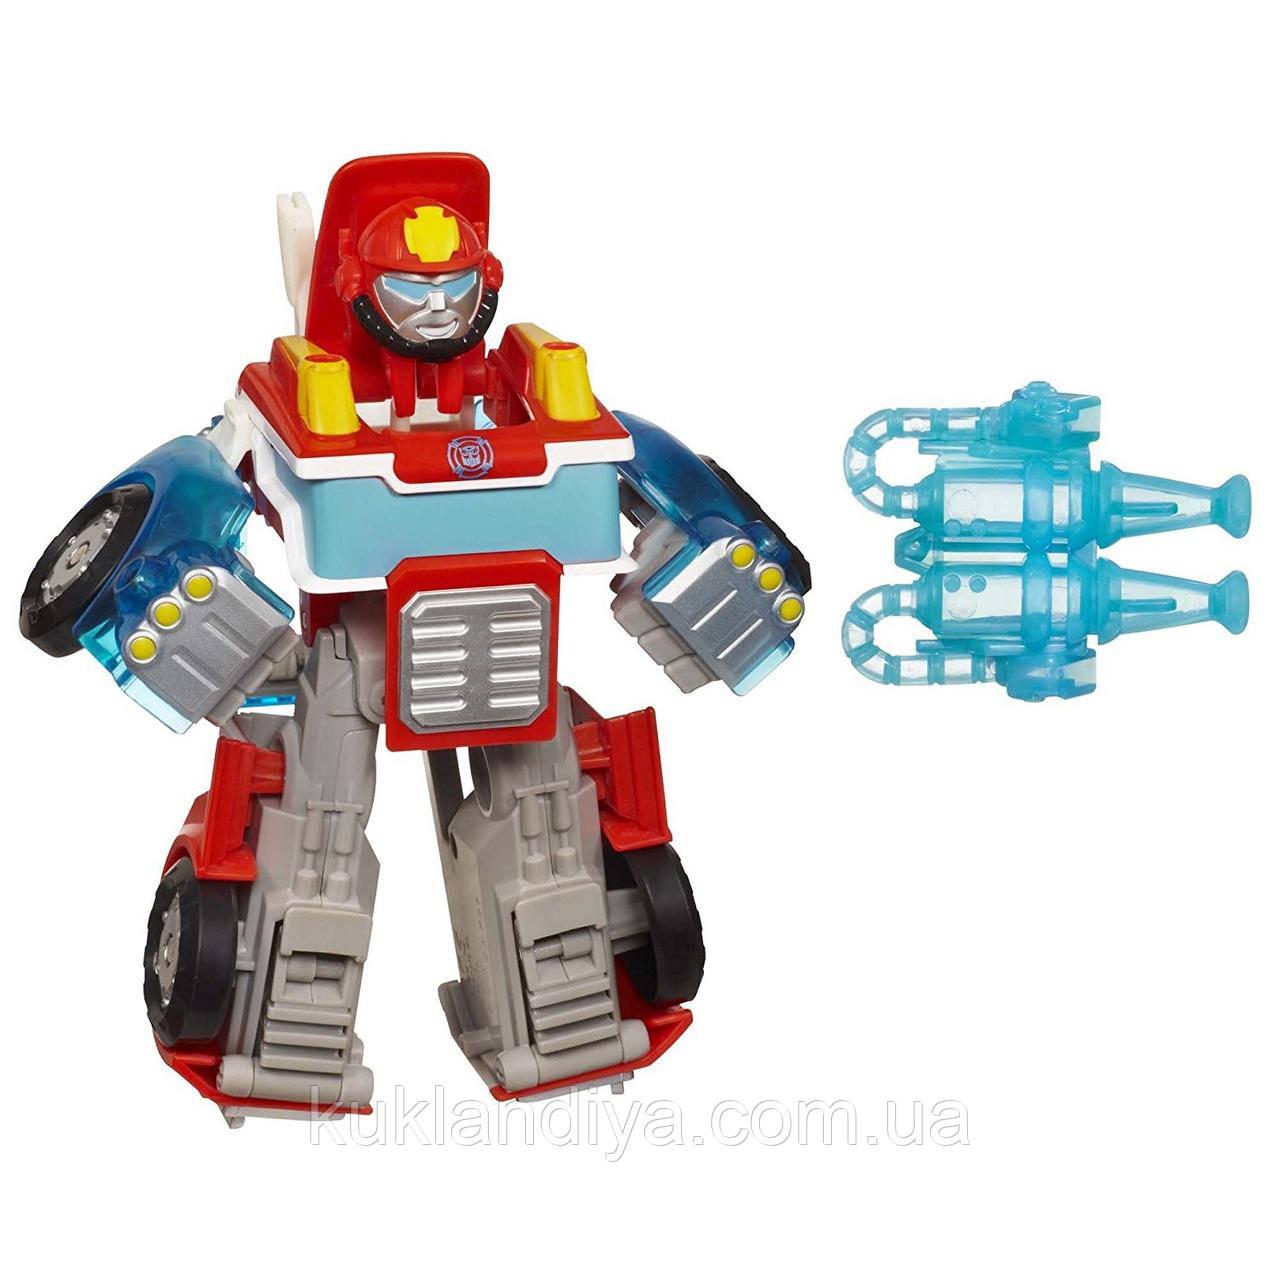 Playskool Heroes Transformers Rescue Bots бот Хитвейв